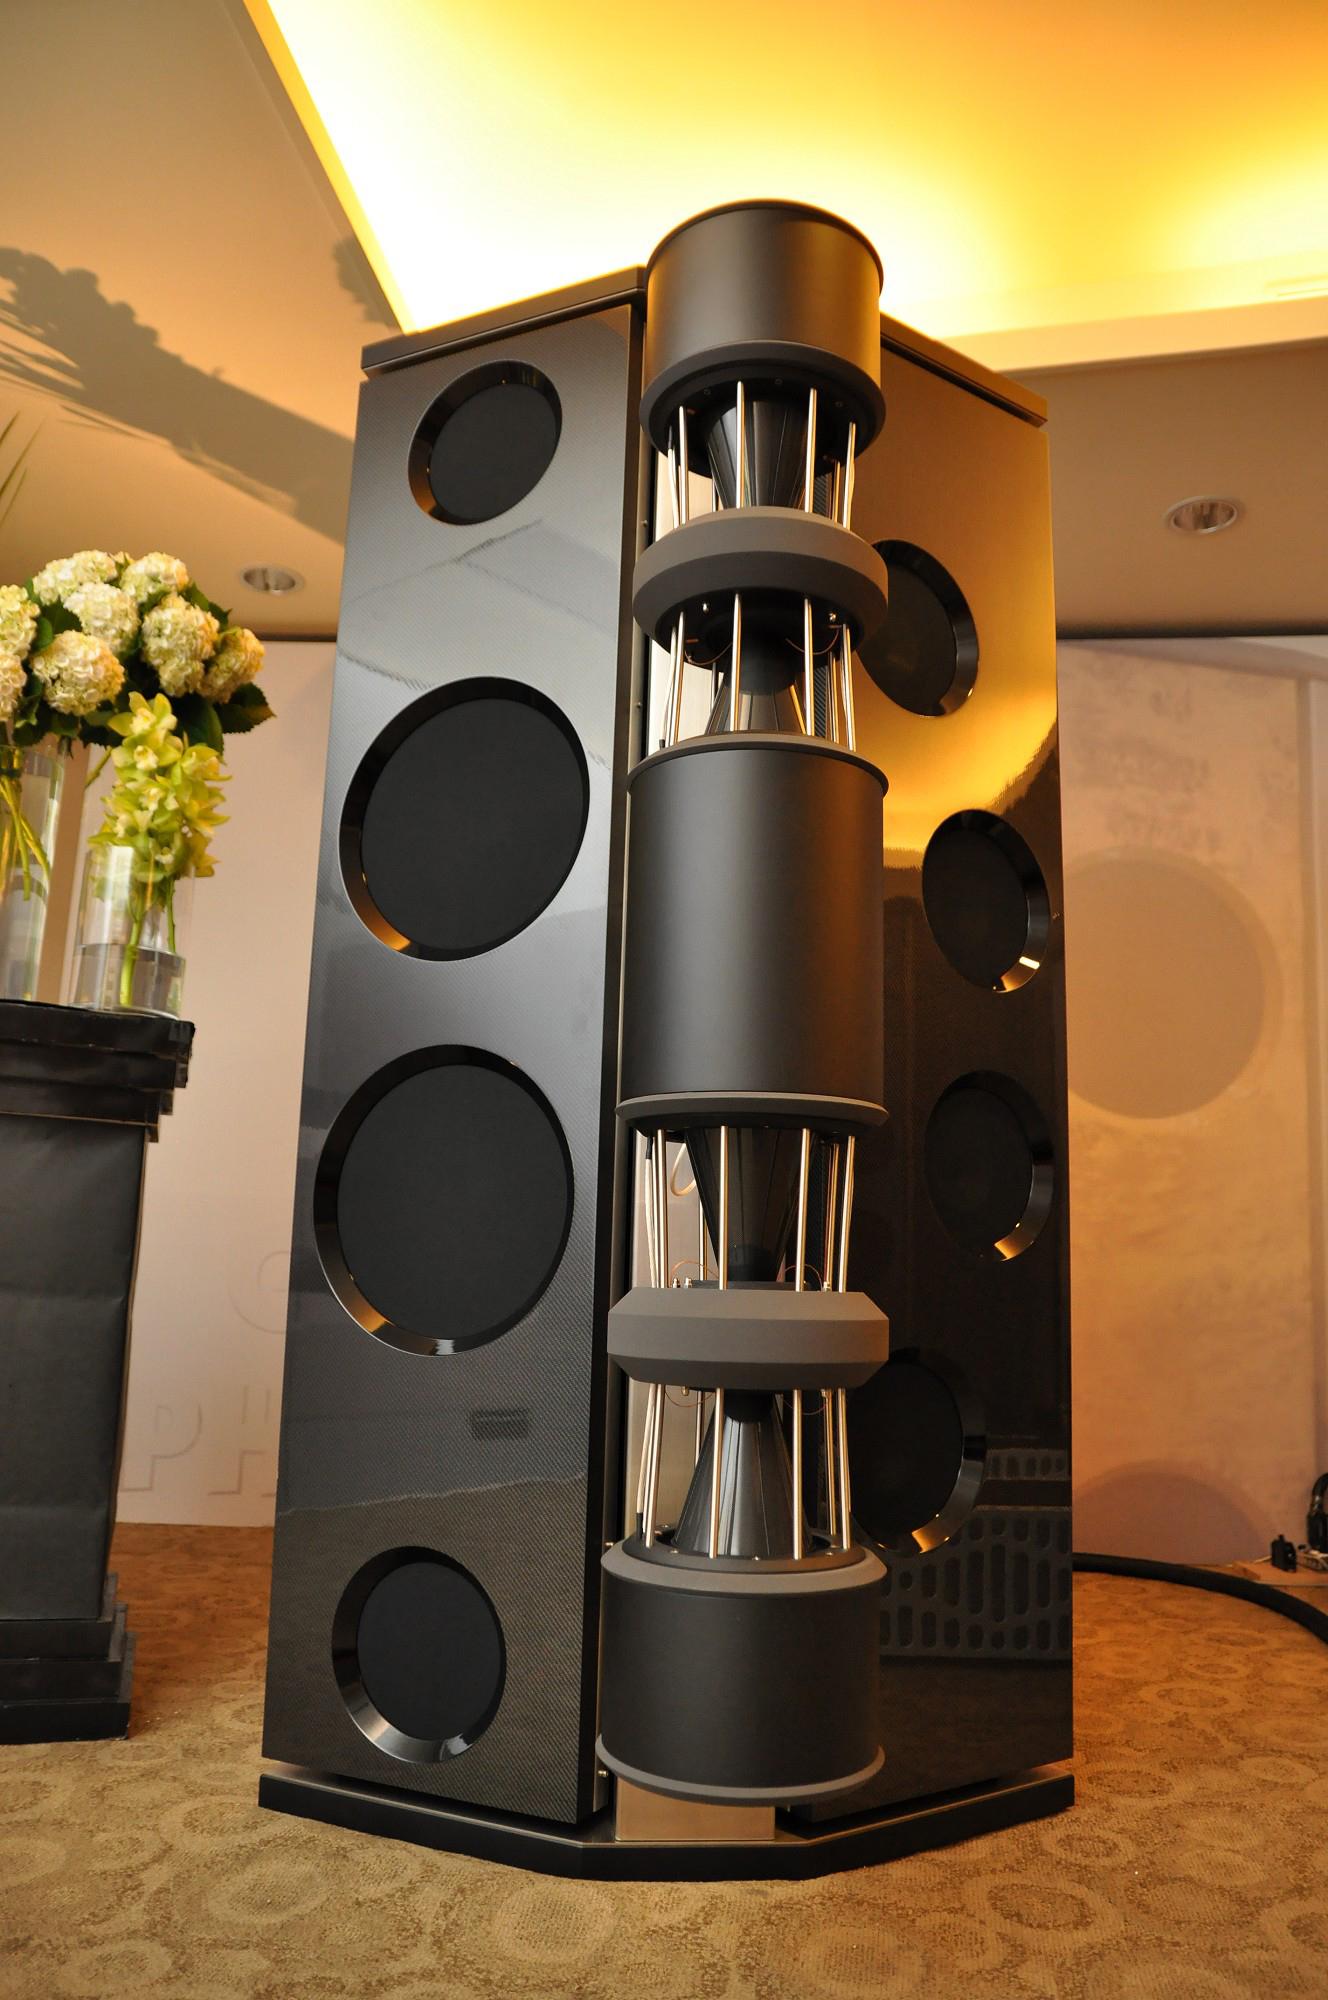 Emperor MK II loudspeaker in carbon fibre | Taiwan Audio Show 2011